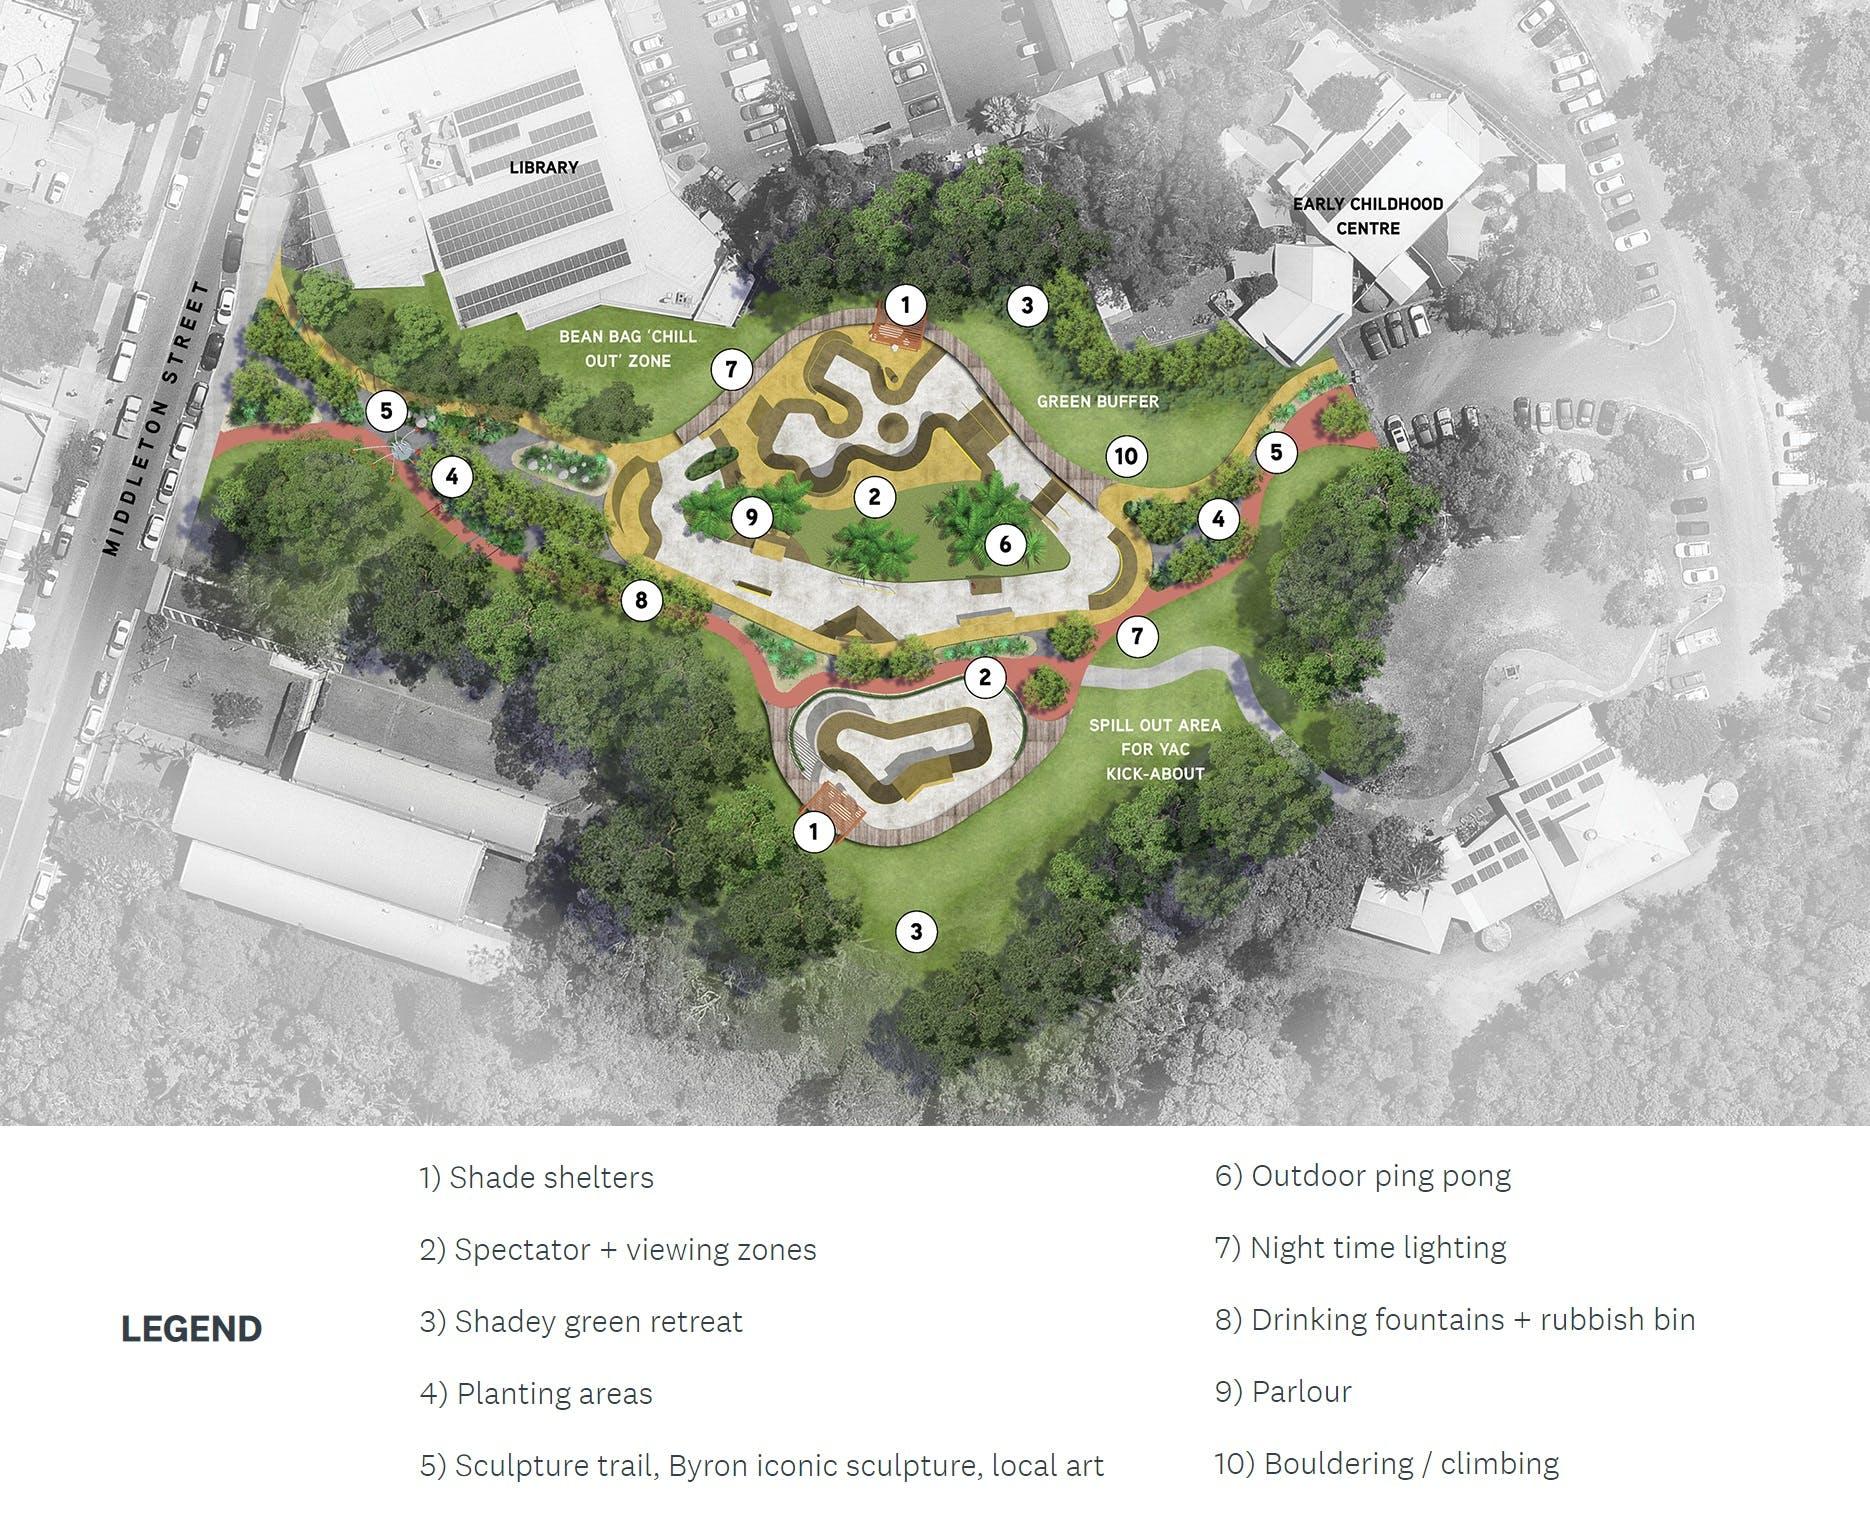 Wider recreation precinct and amenities